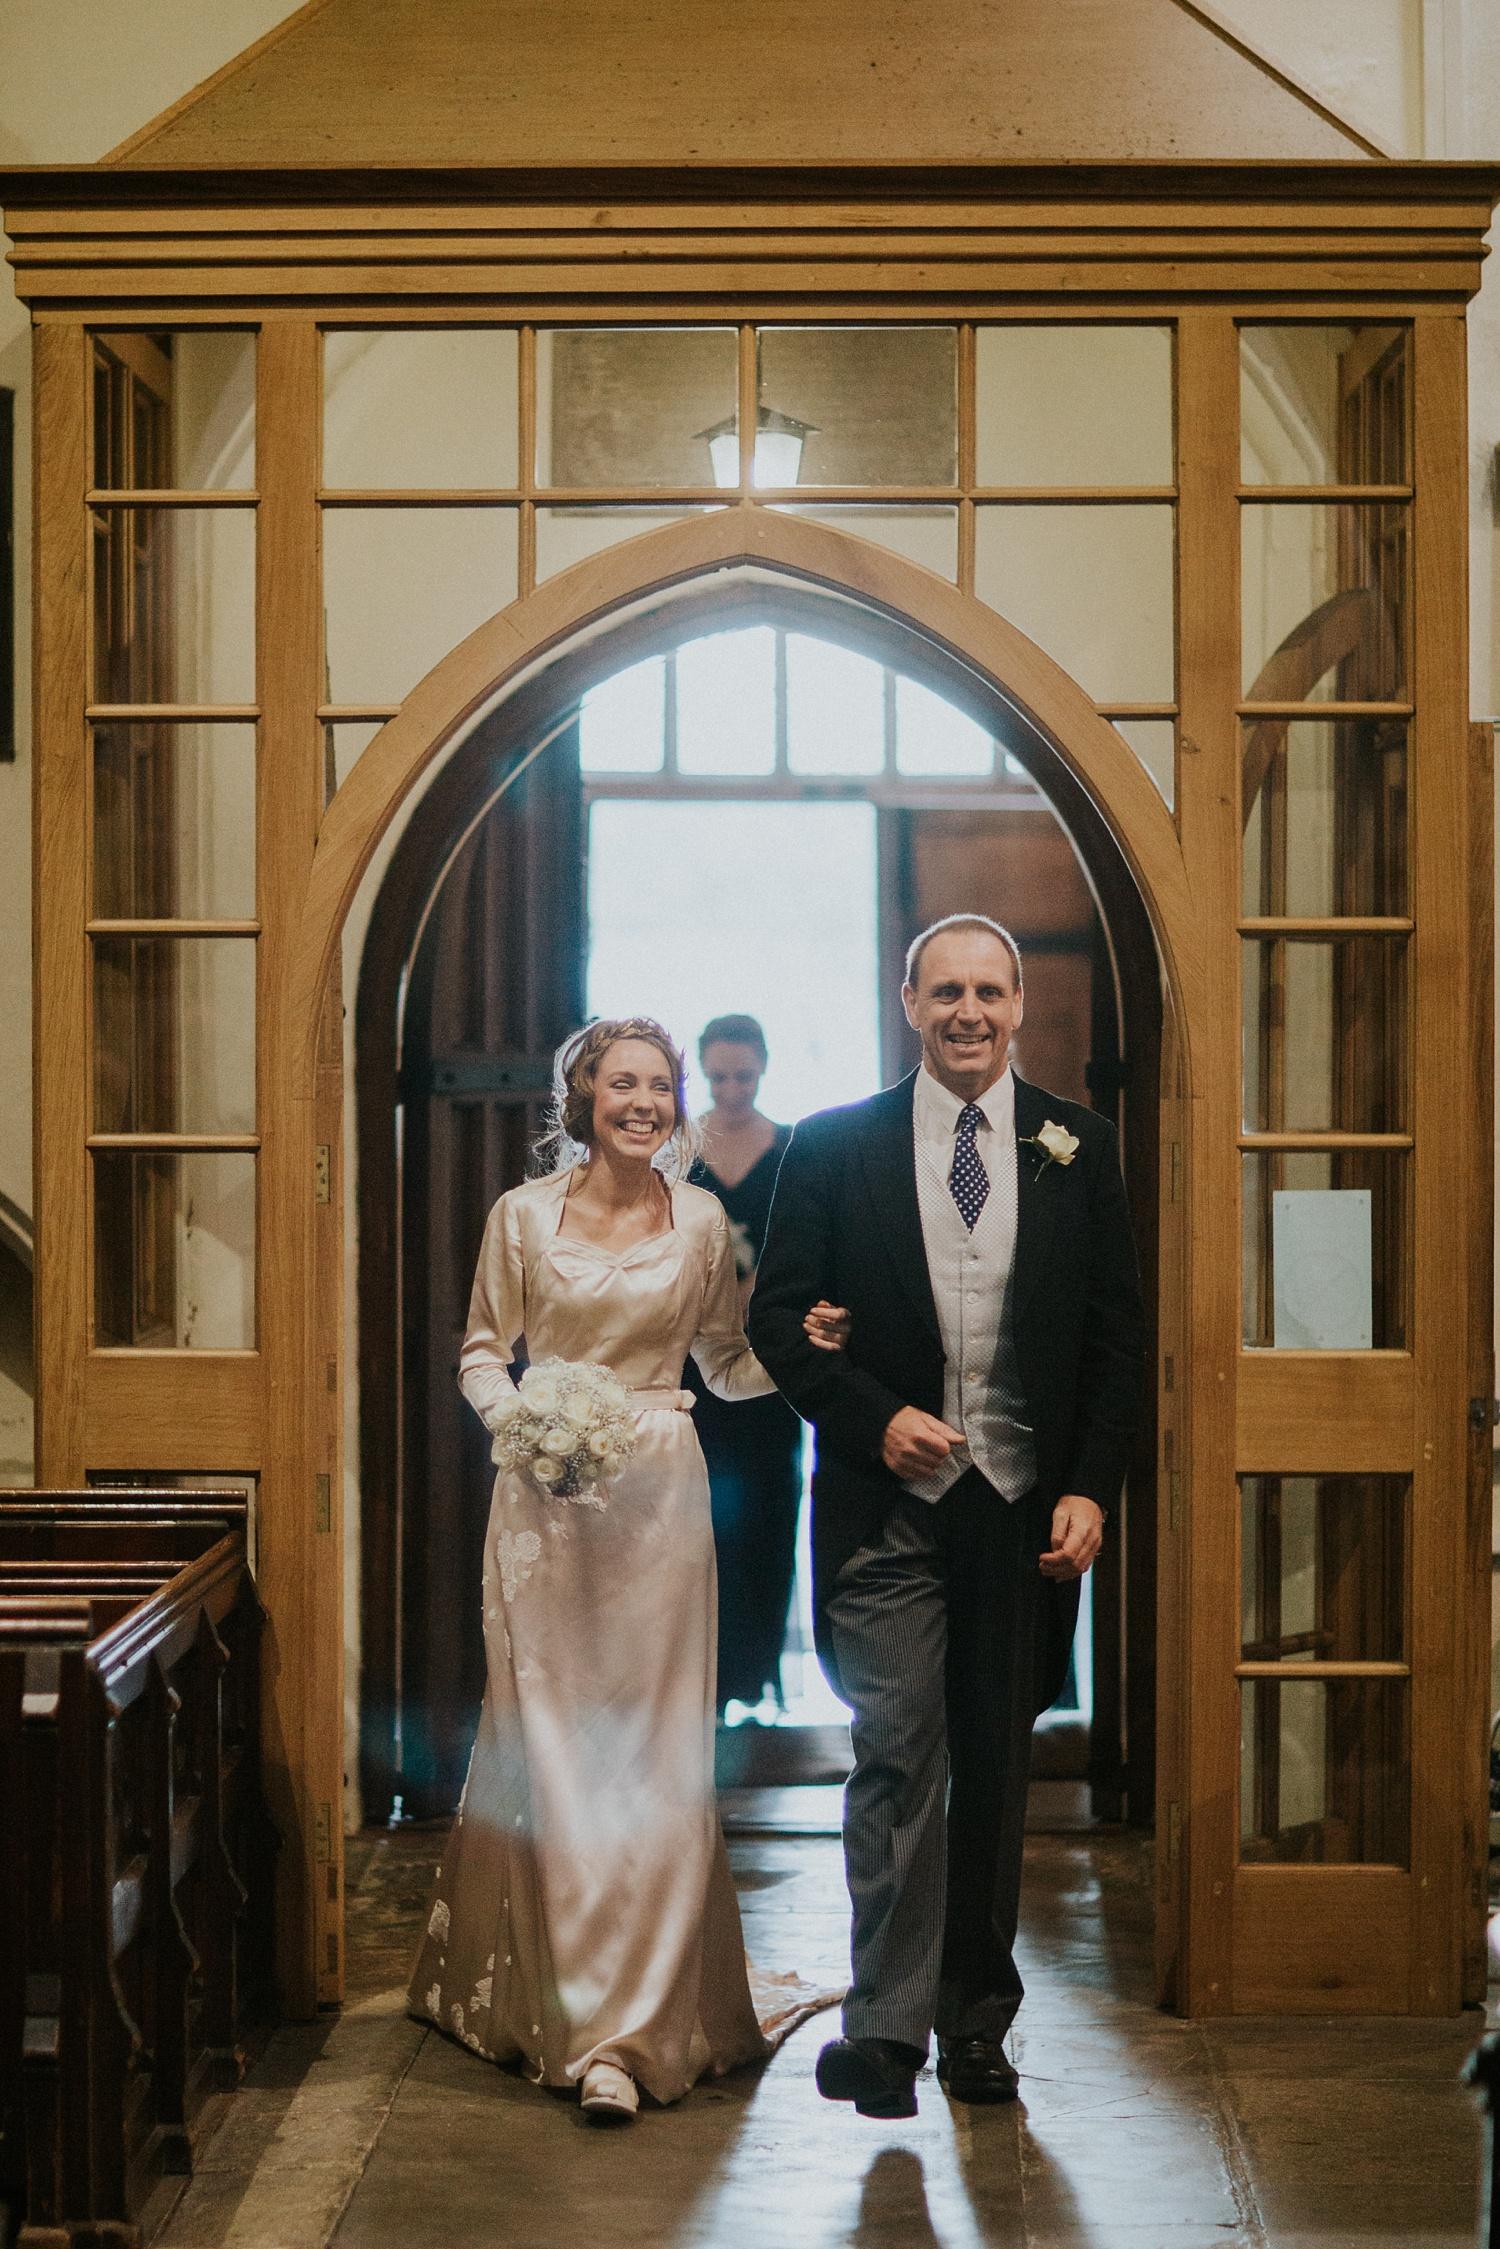 Carberry-Tower-wedding-photographer__0395.jpg